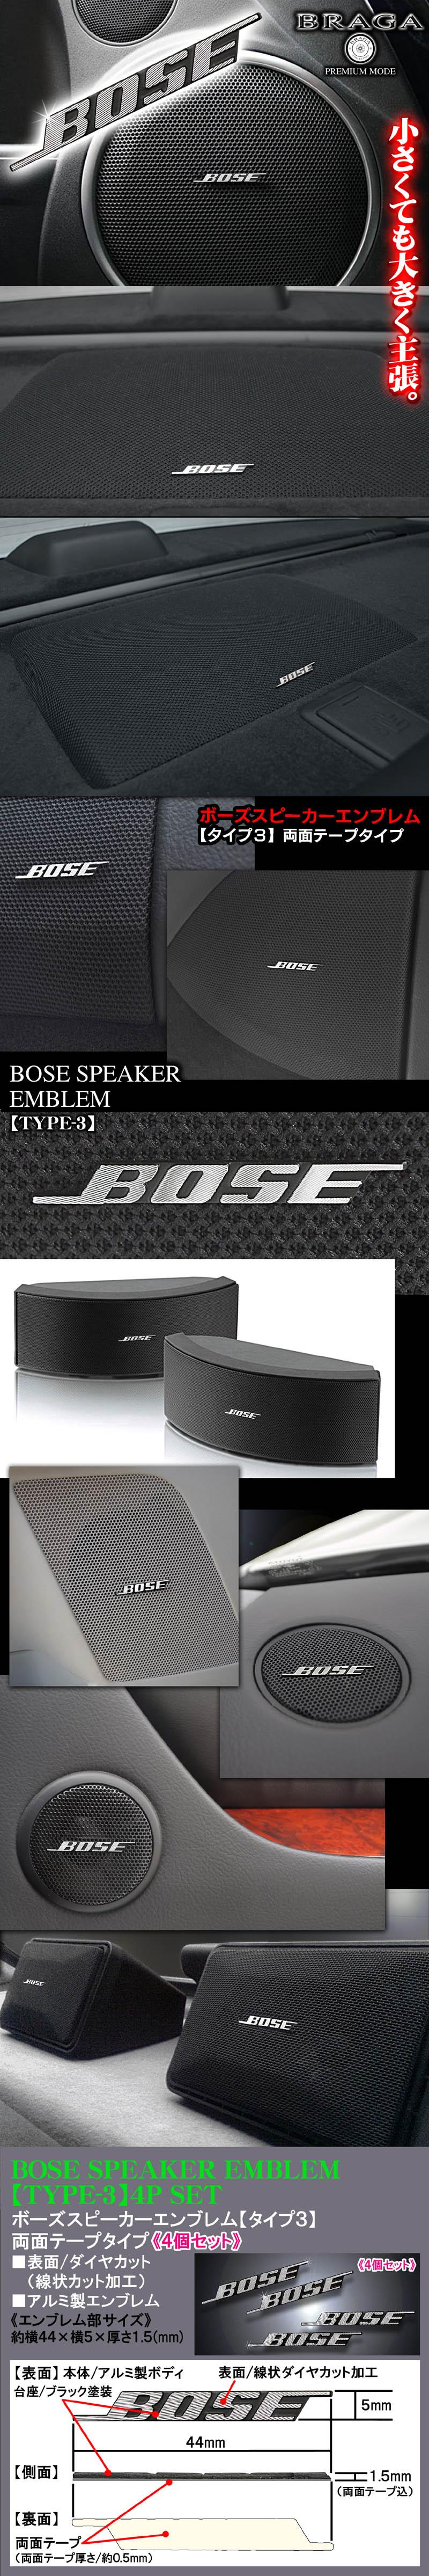 《BOSE》ボーズスピーカーエンブレム《タイプ3》4個セット【両面テープタイプ】アルミ製線状ダイヤカット仕上/ブラガ